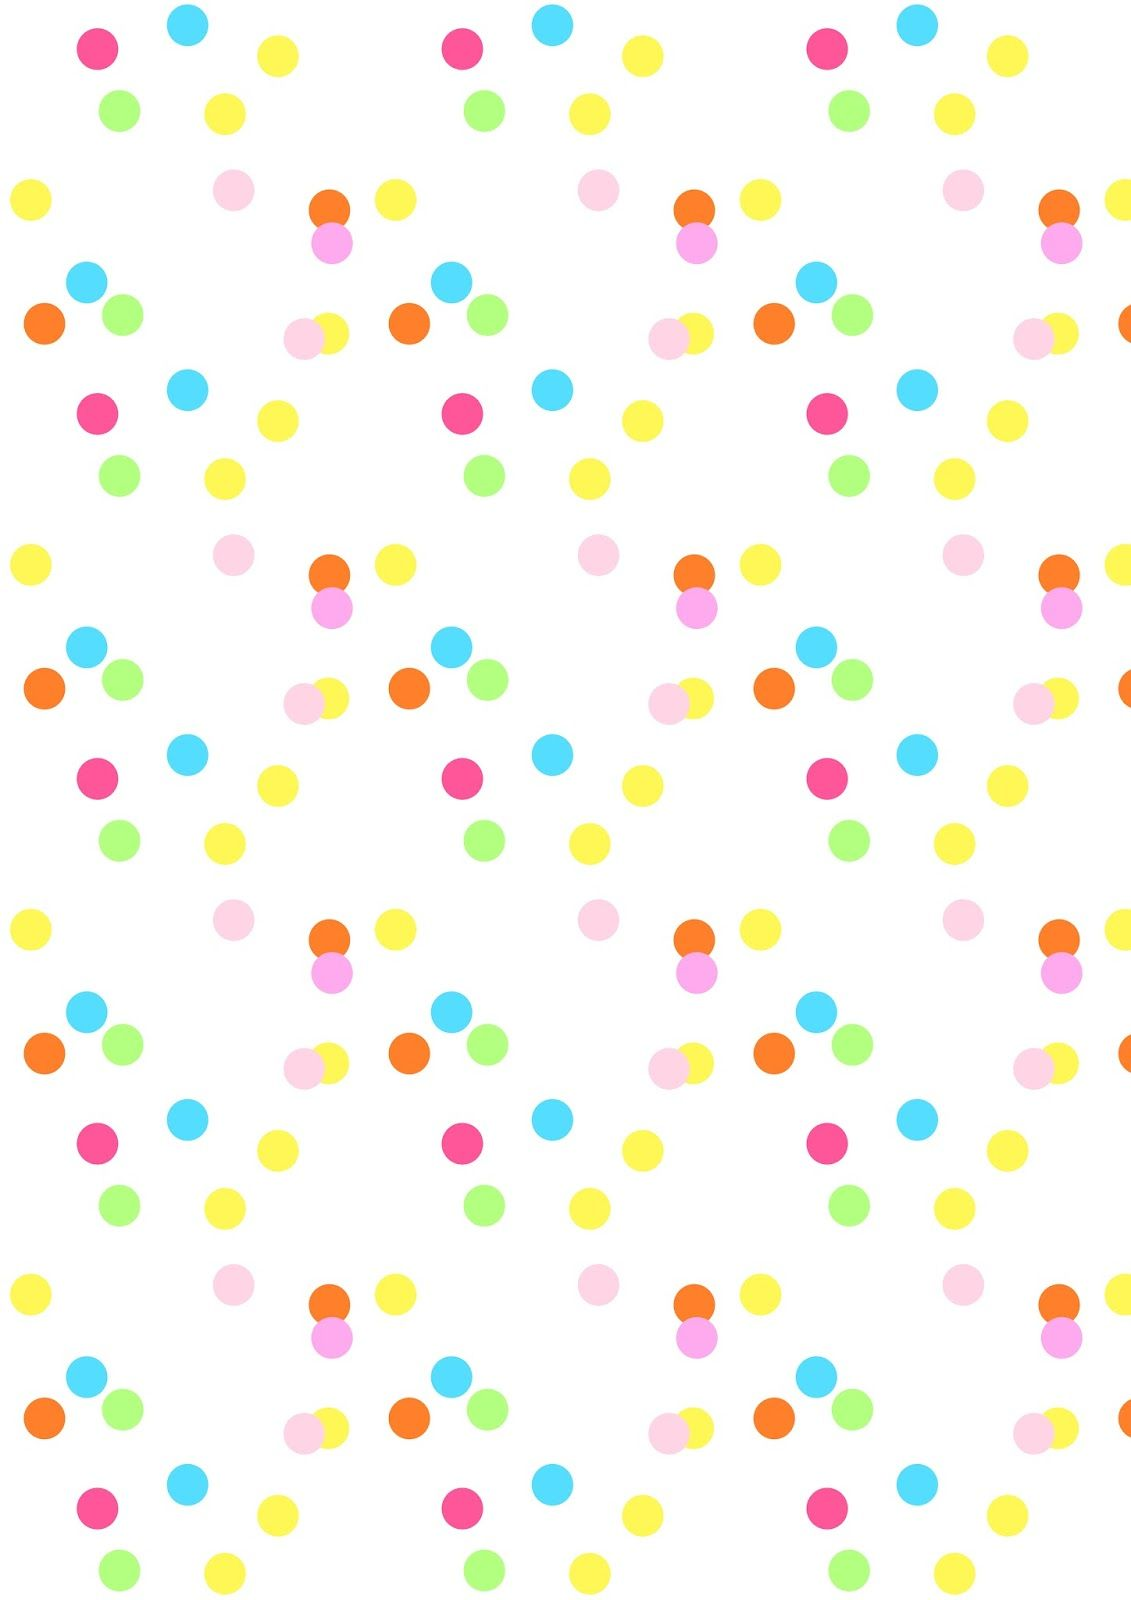 Free digital confetti scrapbooking paper - ausdruckbares Geschenkpapier - freebie   MeinLilaPark – DIY printables and downloads